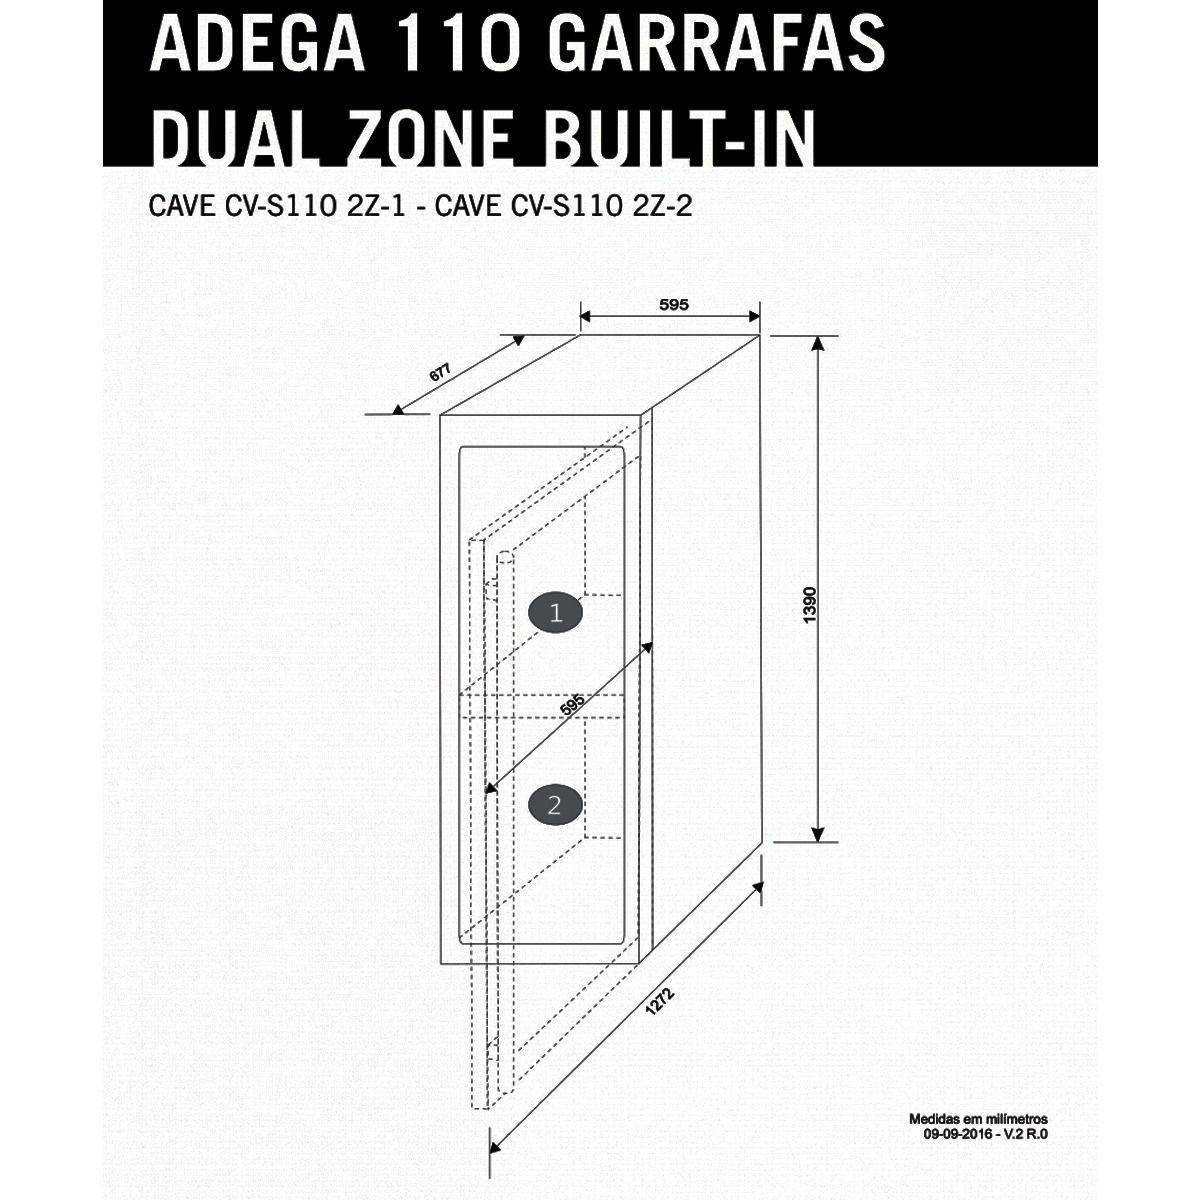 Adega Elettromec 110 Garrafas Built In - Dual Zone - 220V